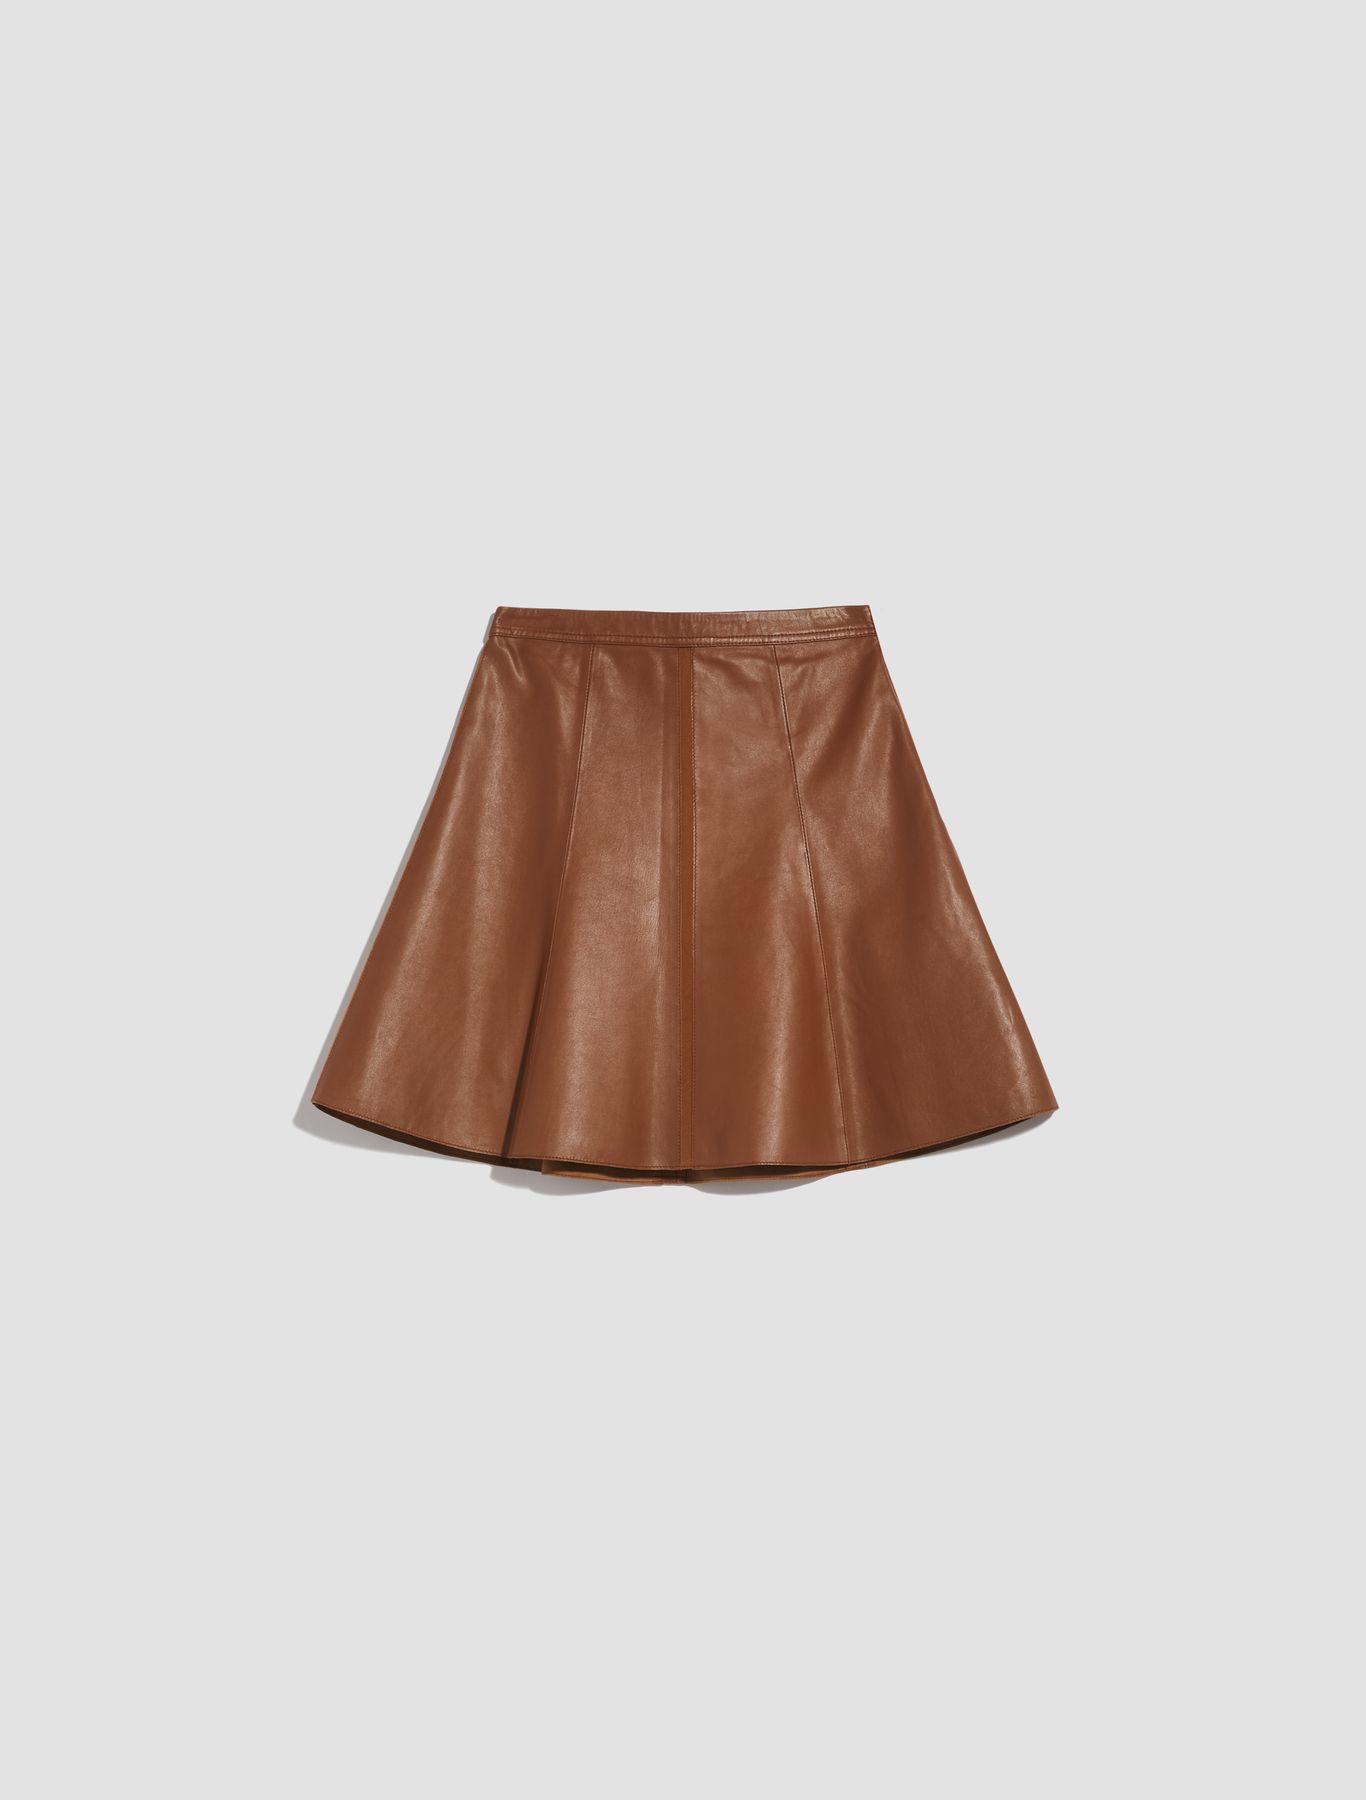 DELEGATO Leather Skirt brown 5